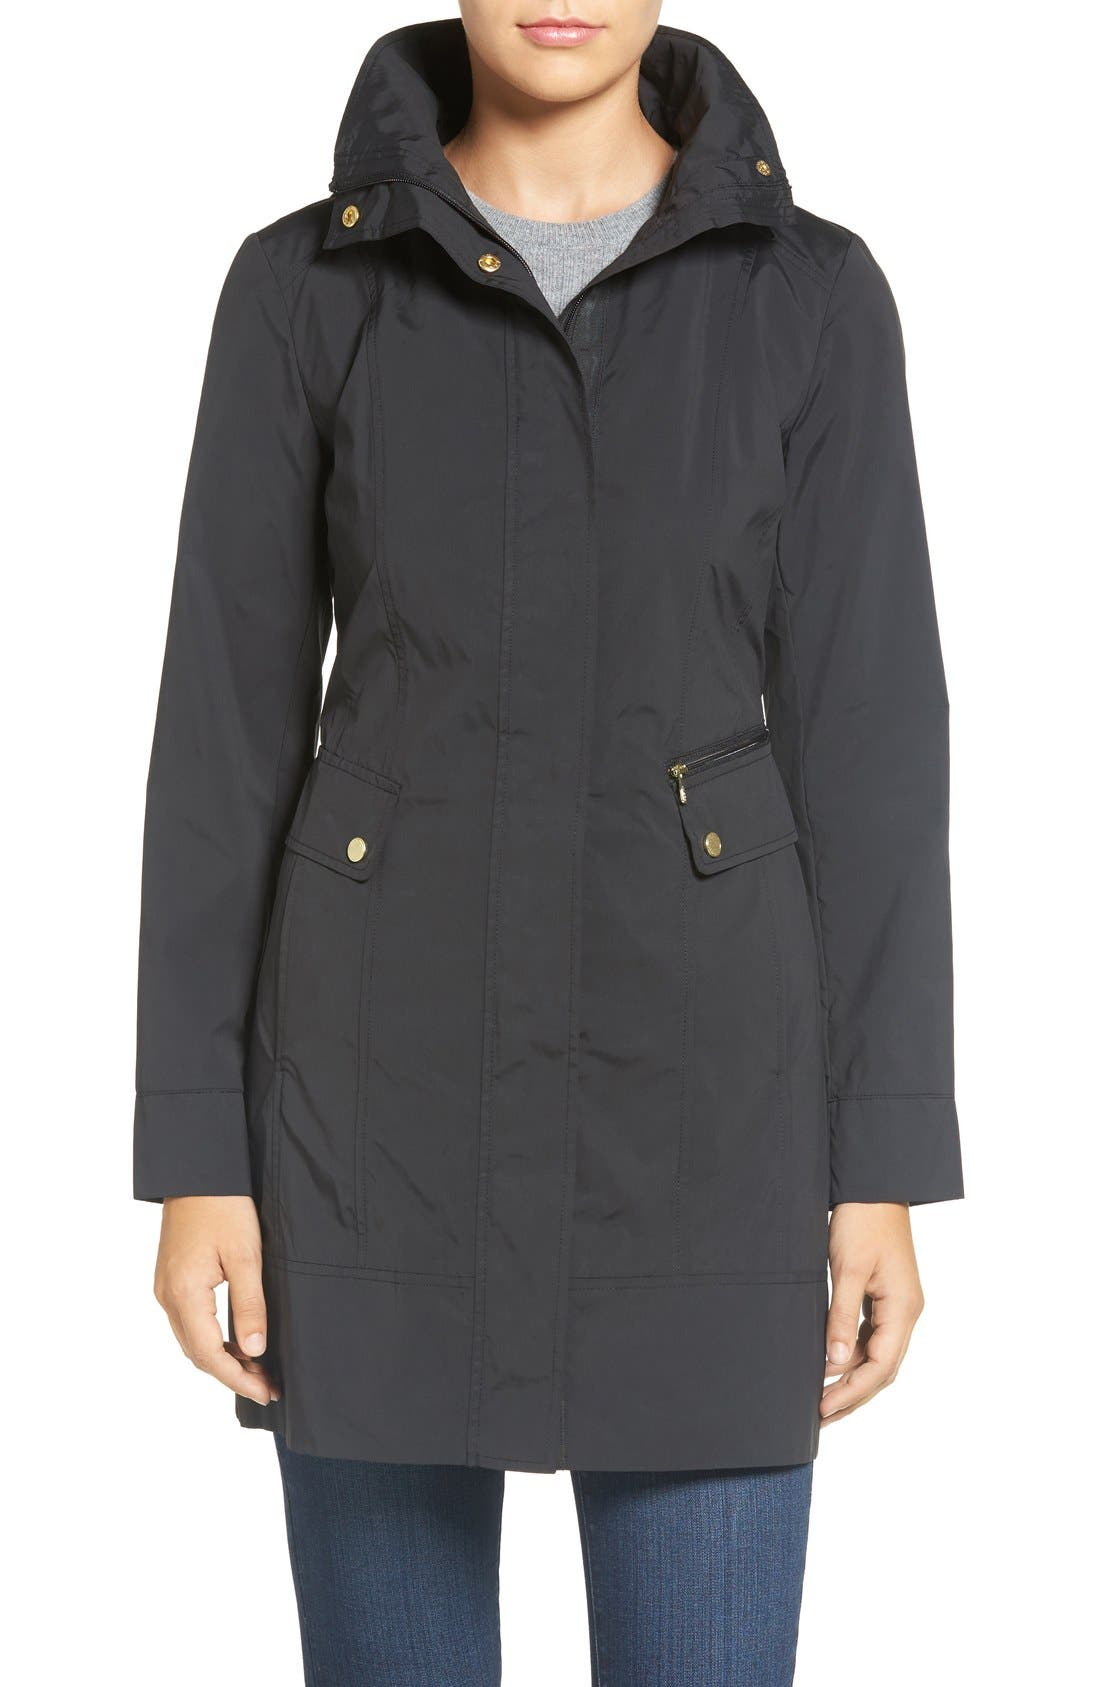 Back Bow Packable Hooded Raincoat, Main, color, BLACK